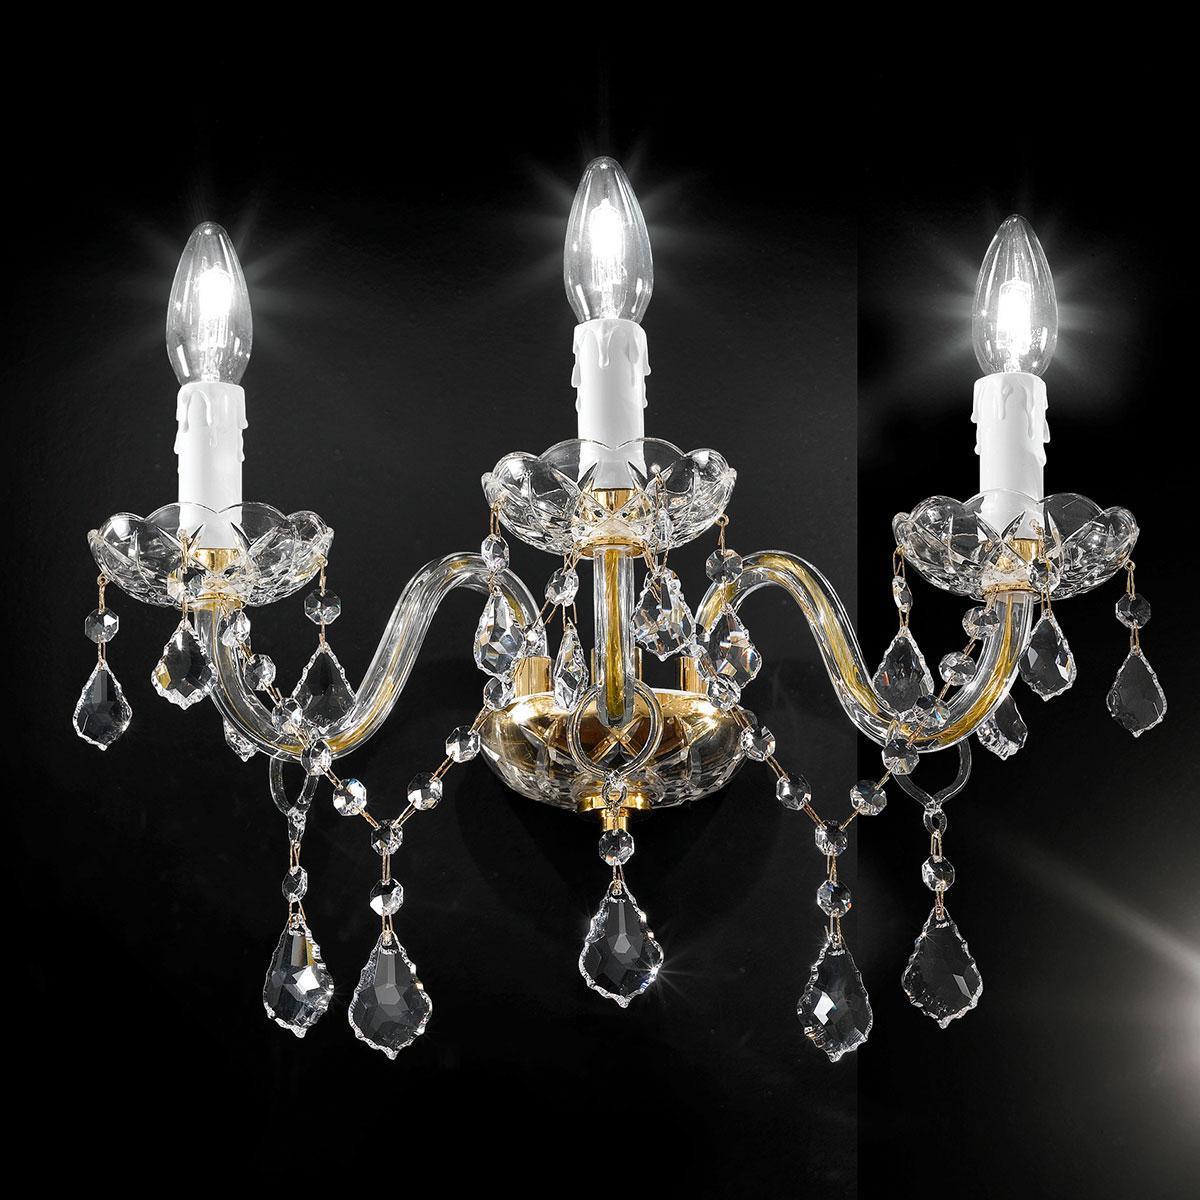 """Botticelli"" venezianischer kristall wandleuchte - 3 flammig - transparent mit kristal Asfour"